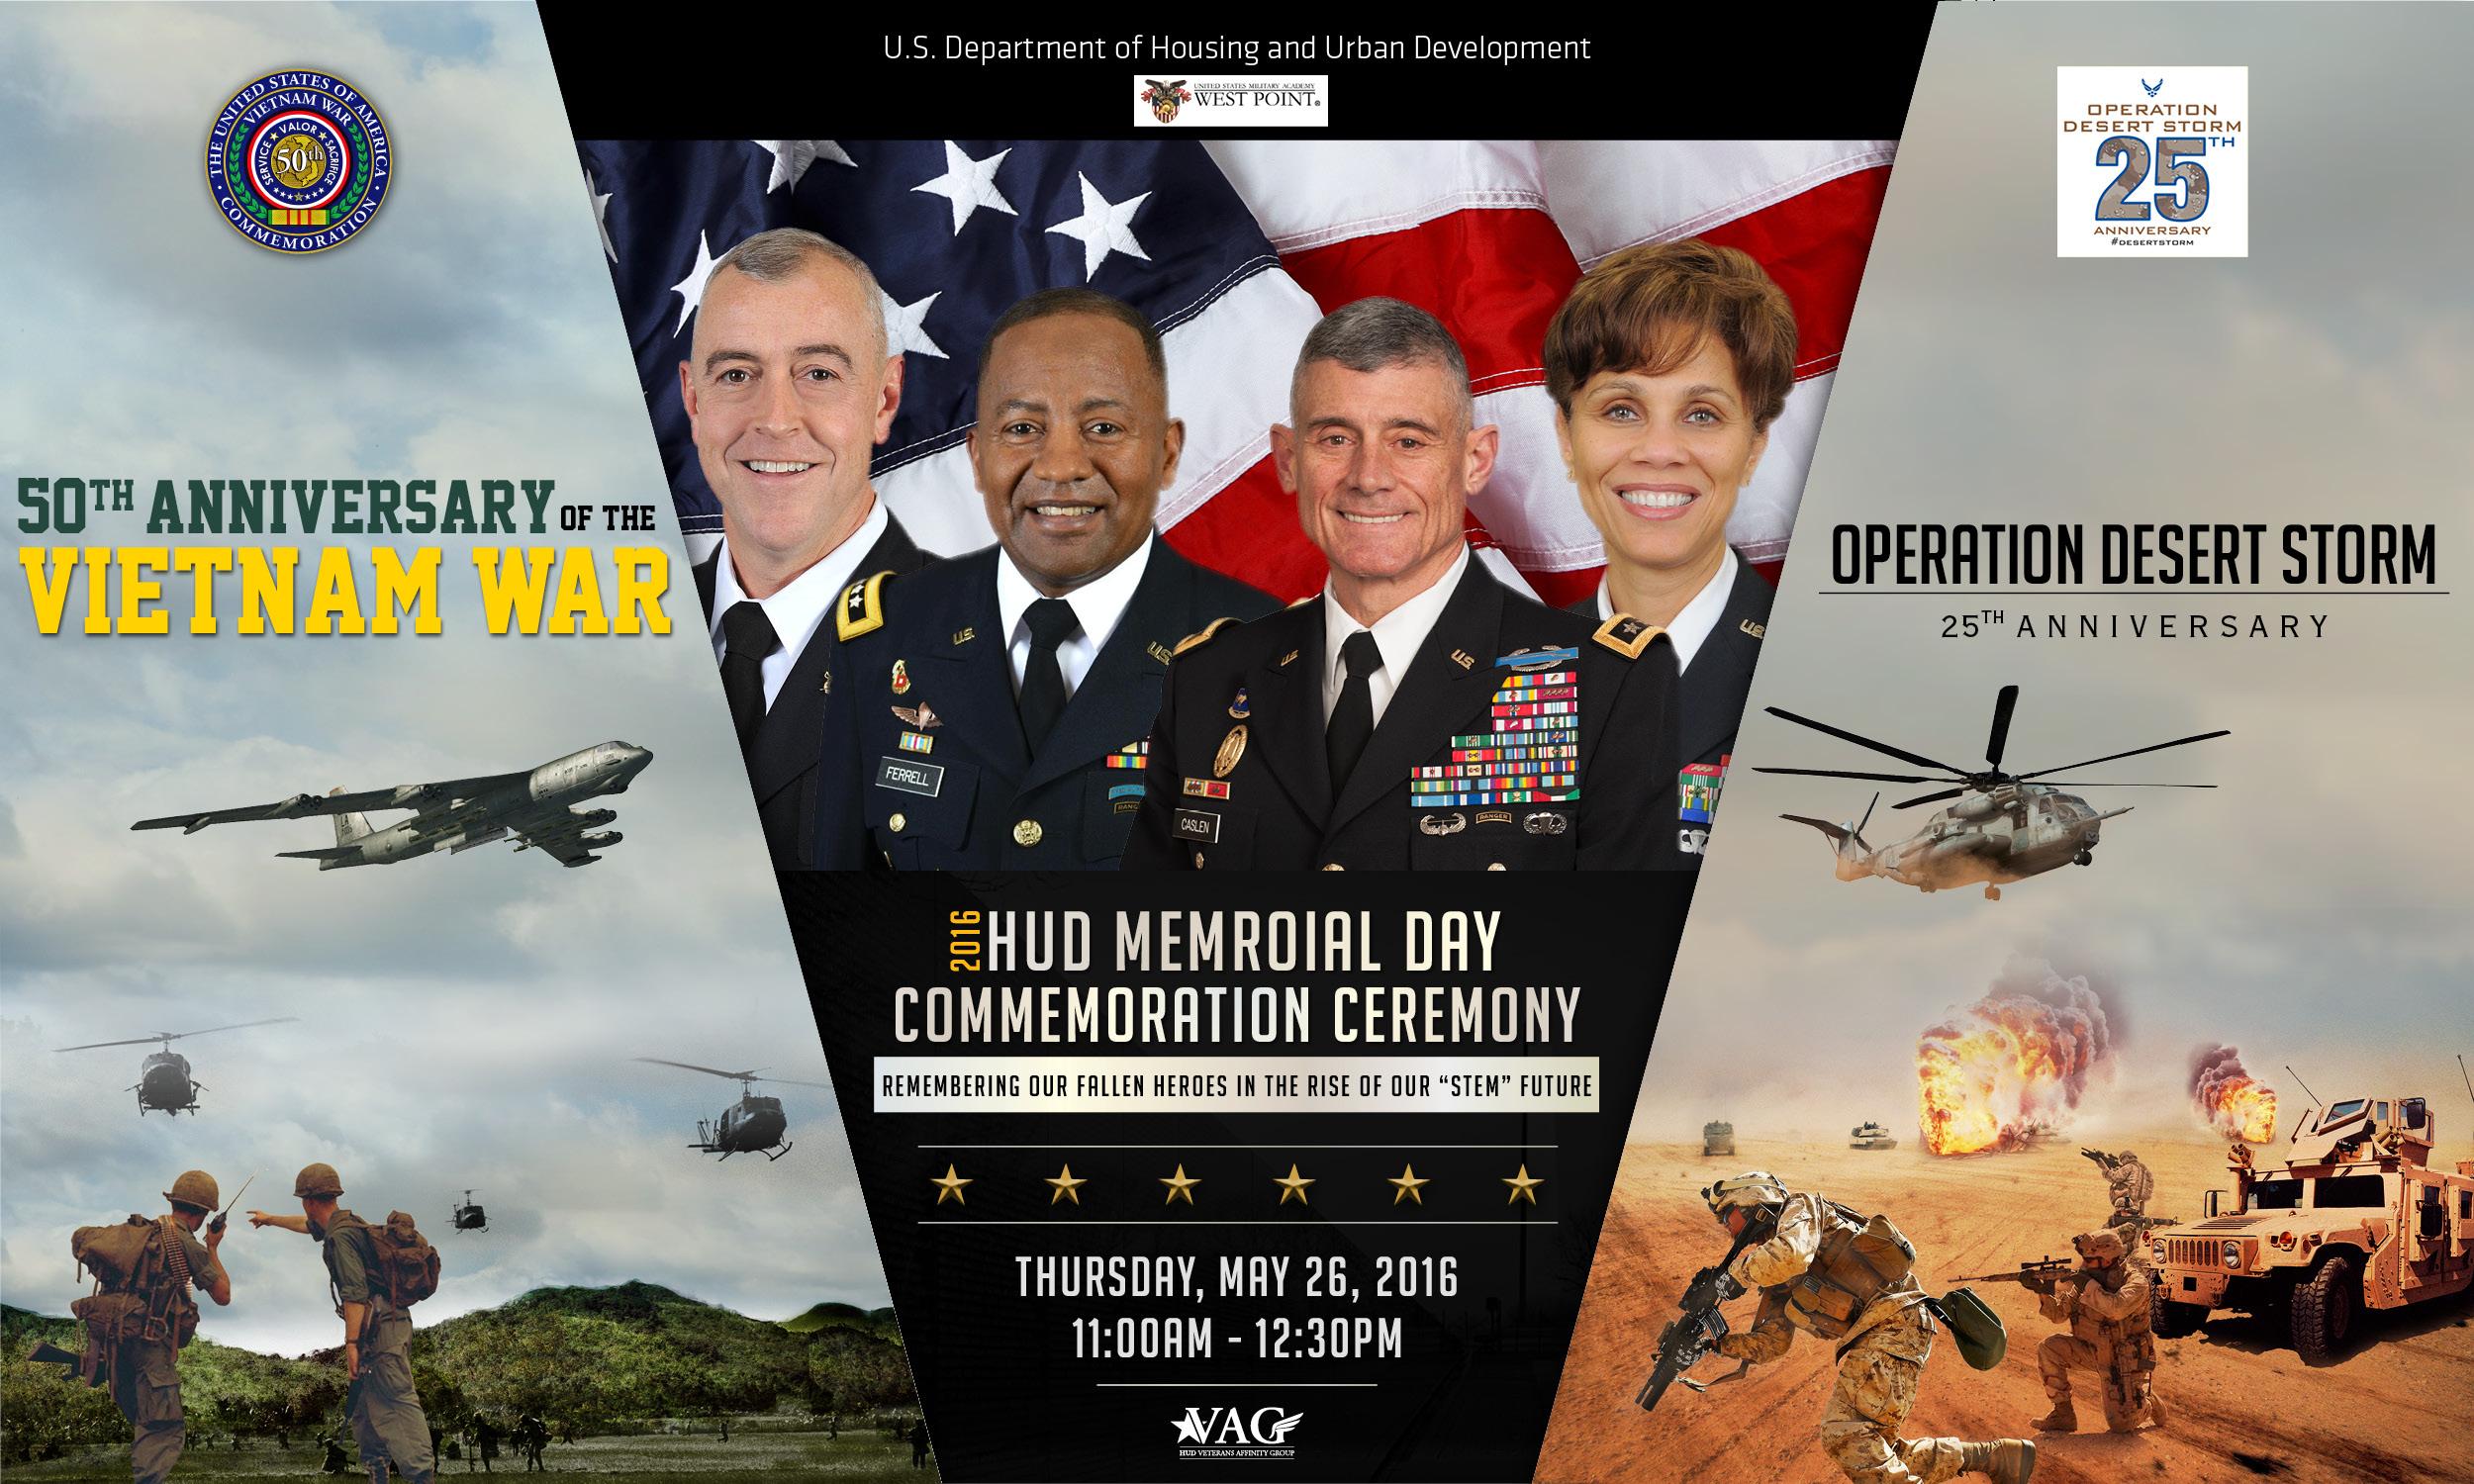 2016 HUD Memorial Day Commemoration Ceremony/50th Anniversary of the Vietnam War Commemoration/25th Anniversary of Desert Storm